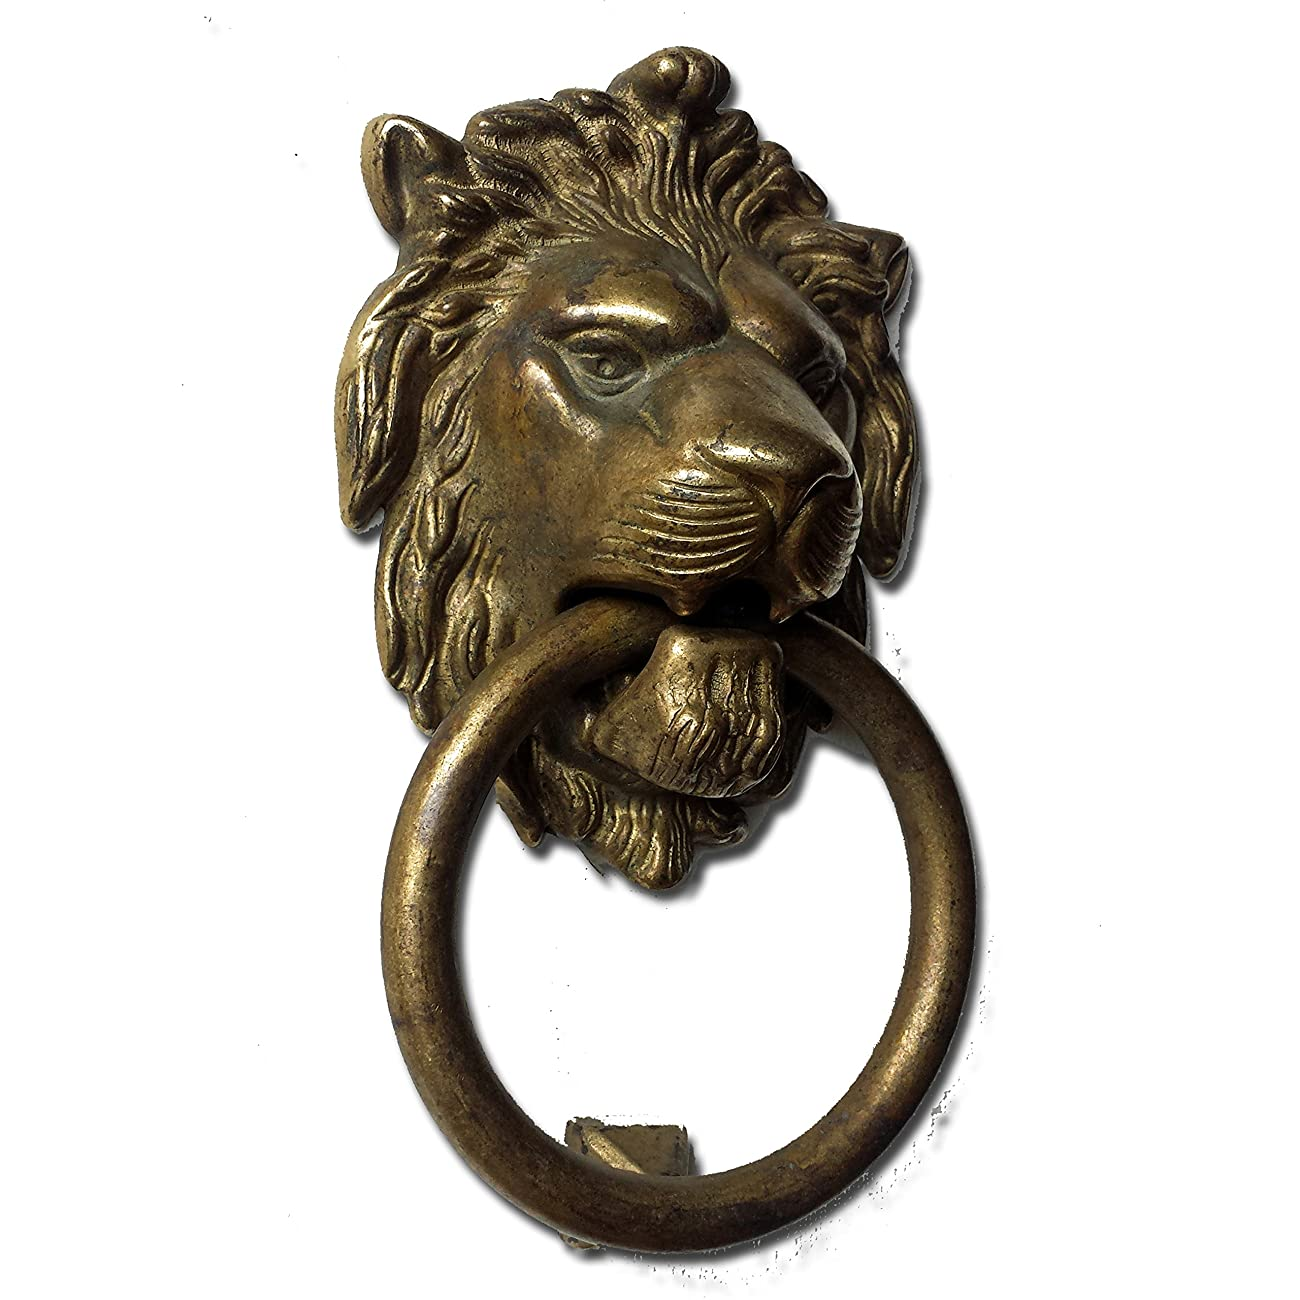 Bosetti Marella 100977.03 Lion Door Knocker, Distressed Antique Brass, 7.5